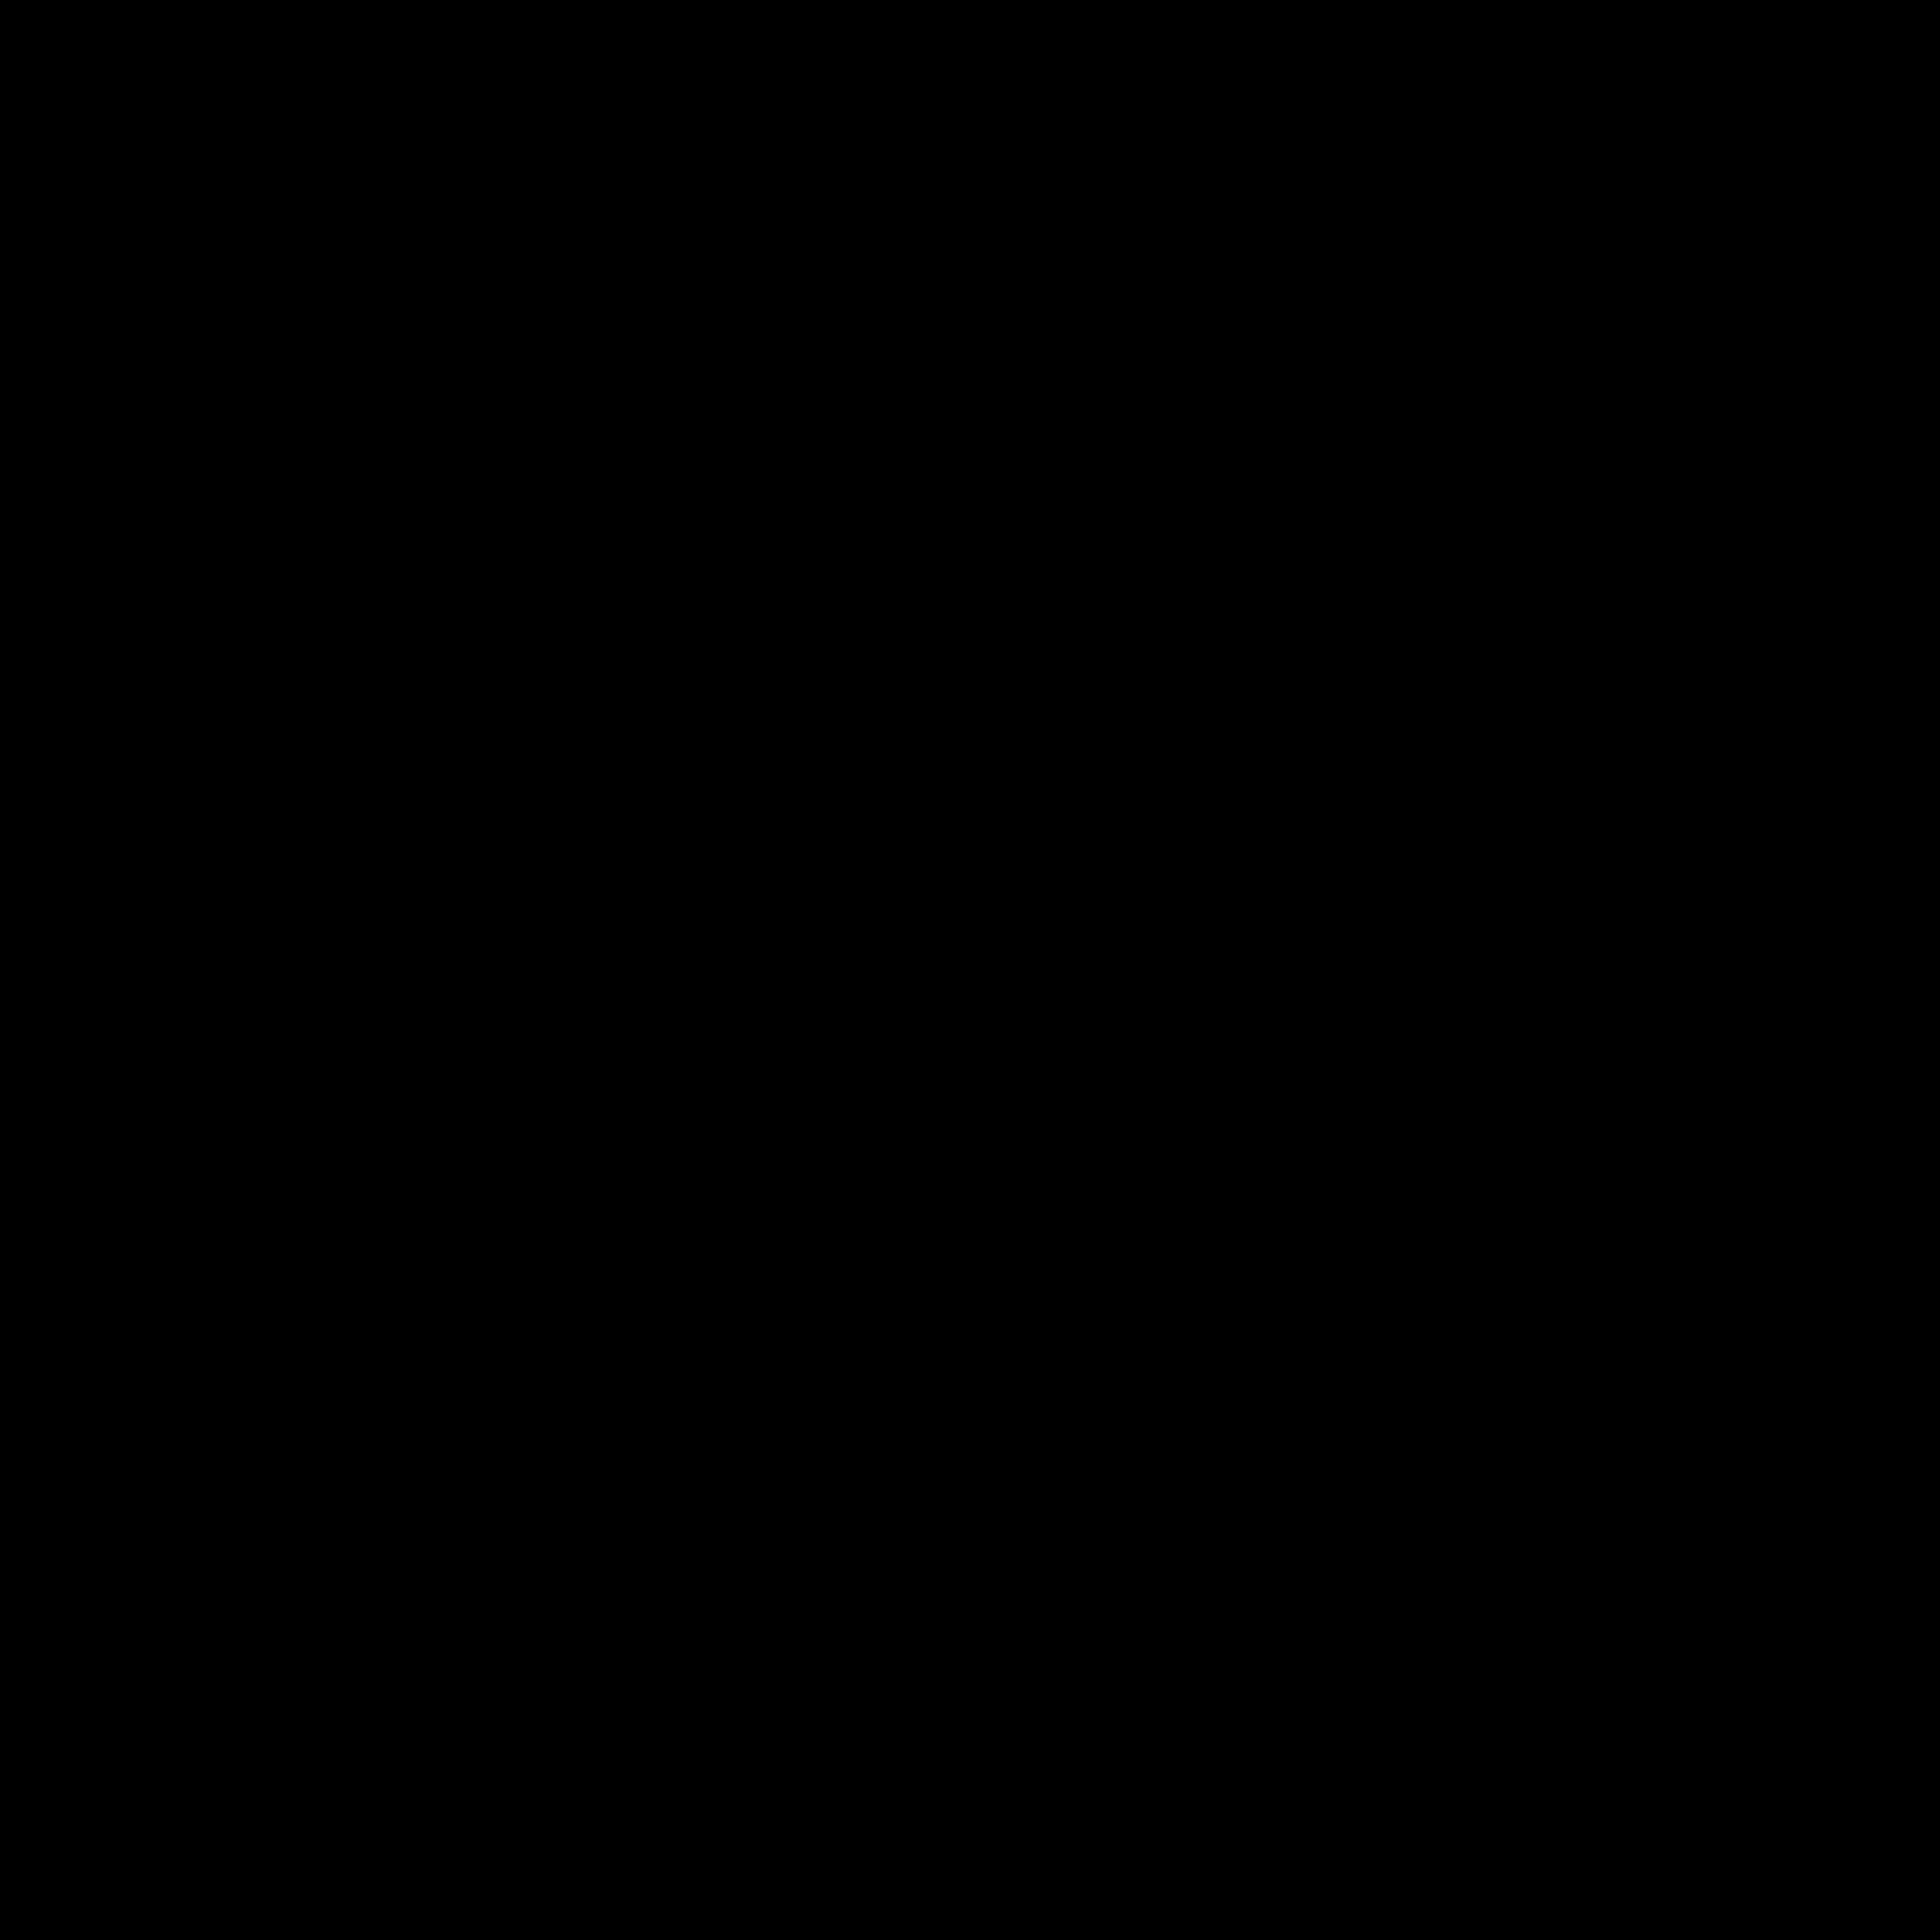 argent apartments logo